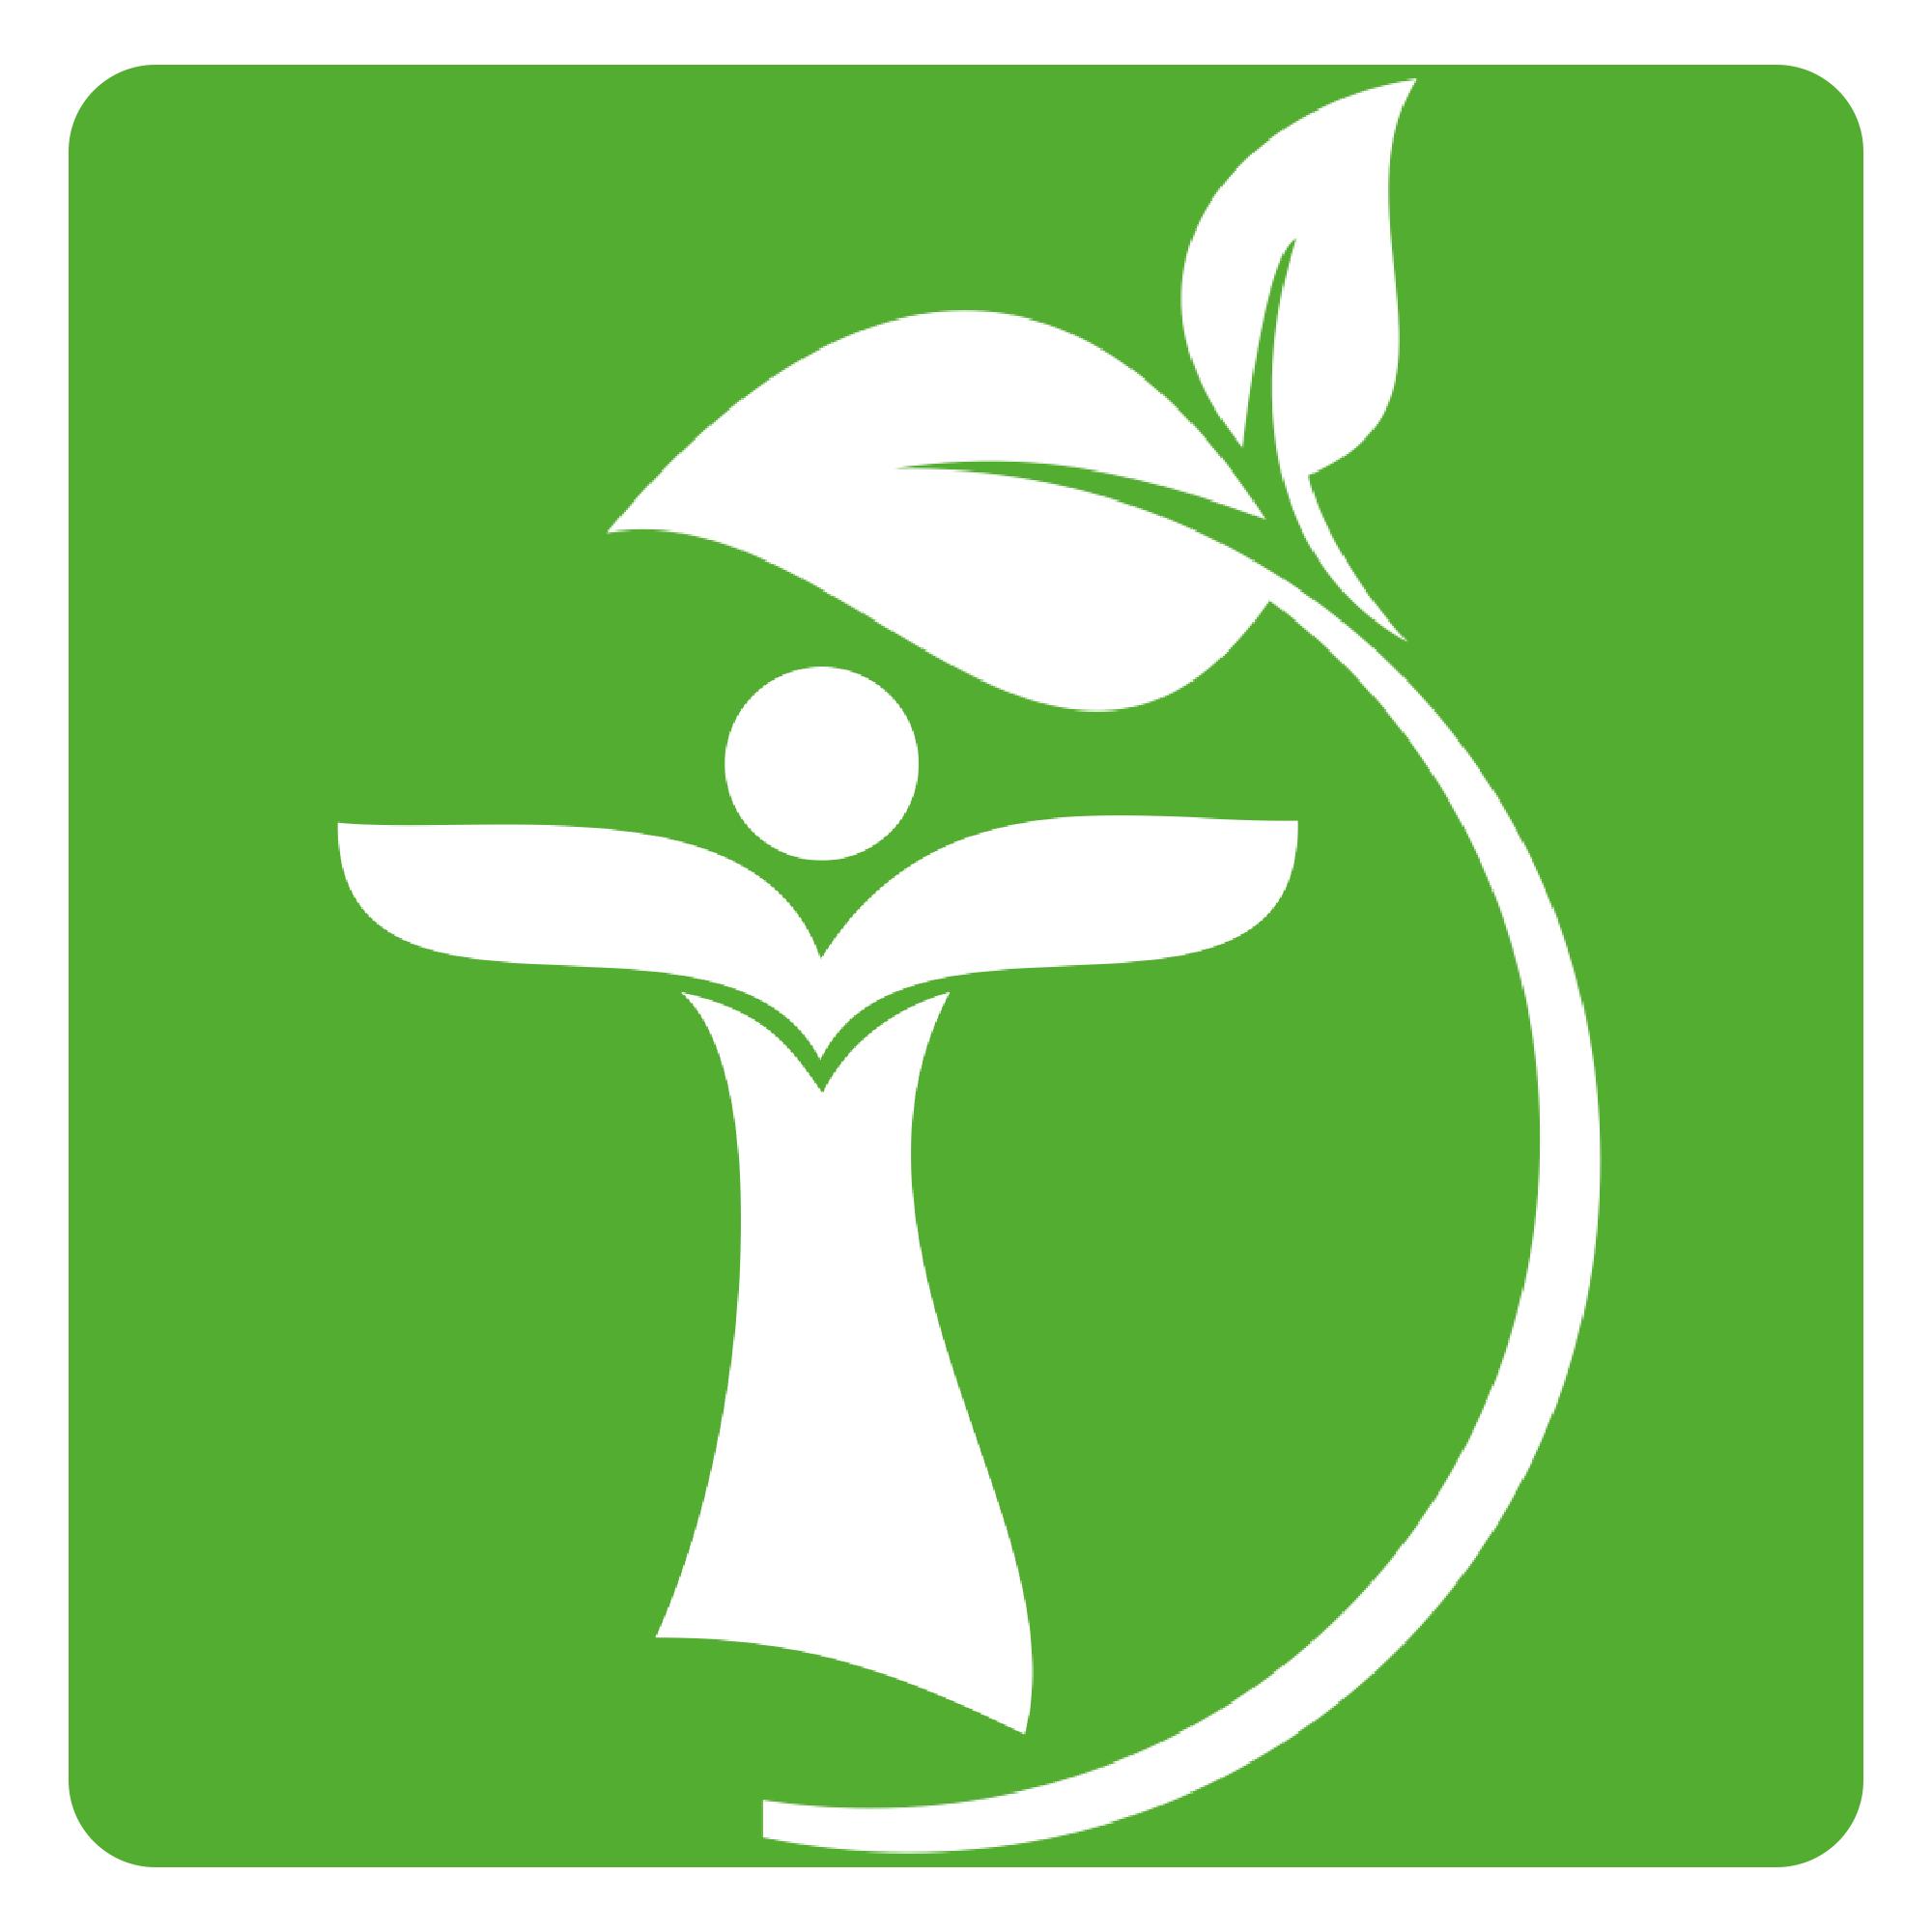 panfila™ global solutions thalir